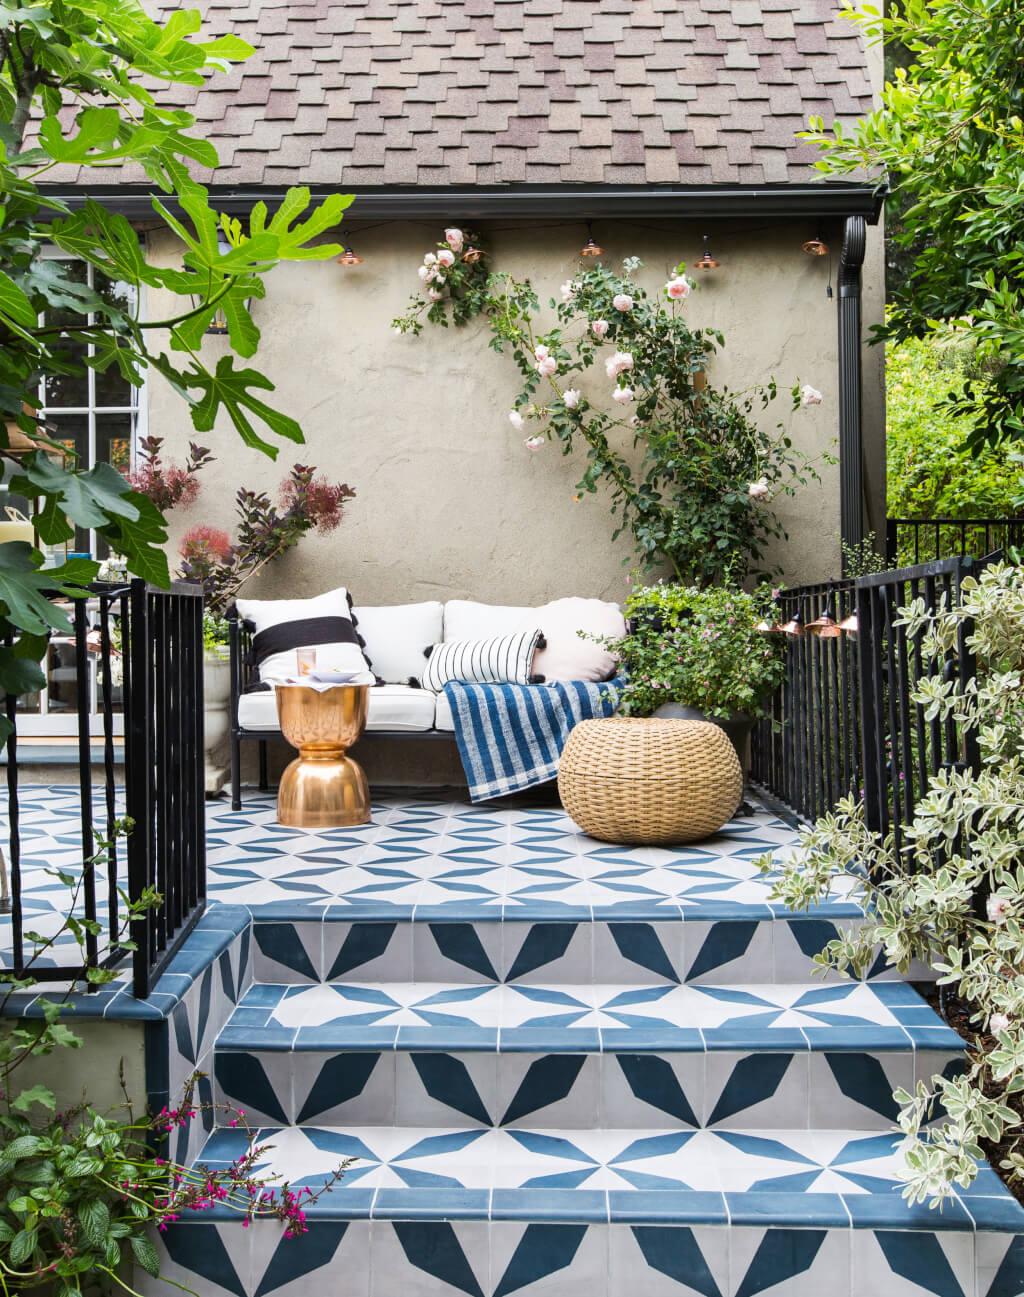 Emily-Henderson_House-Beautiful_Courtyard_Tile_Modern_English_Country_4-1024x1297.jpg